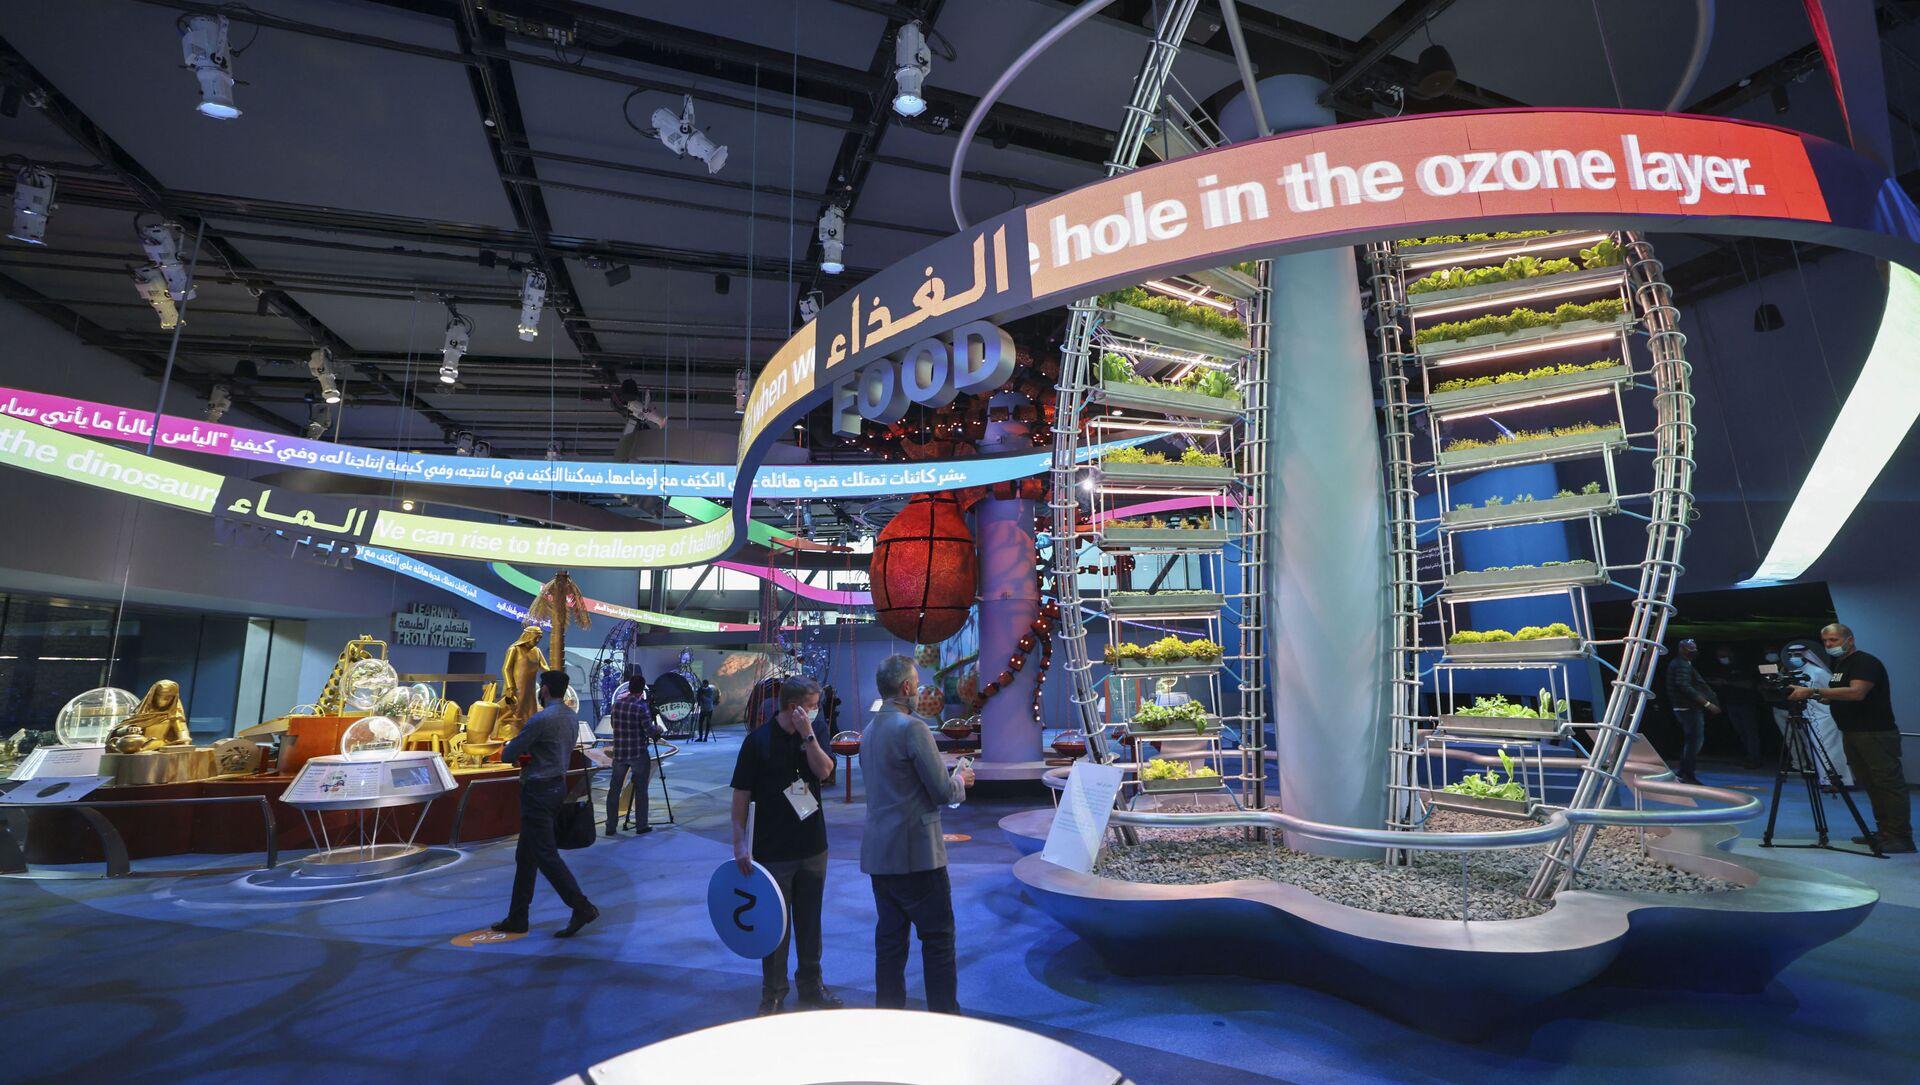 Павильон устойчивого развития на Dubai Expo 2020, фото из архива - Sputnik Азербайджан, 1920, 23.08.2021